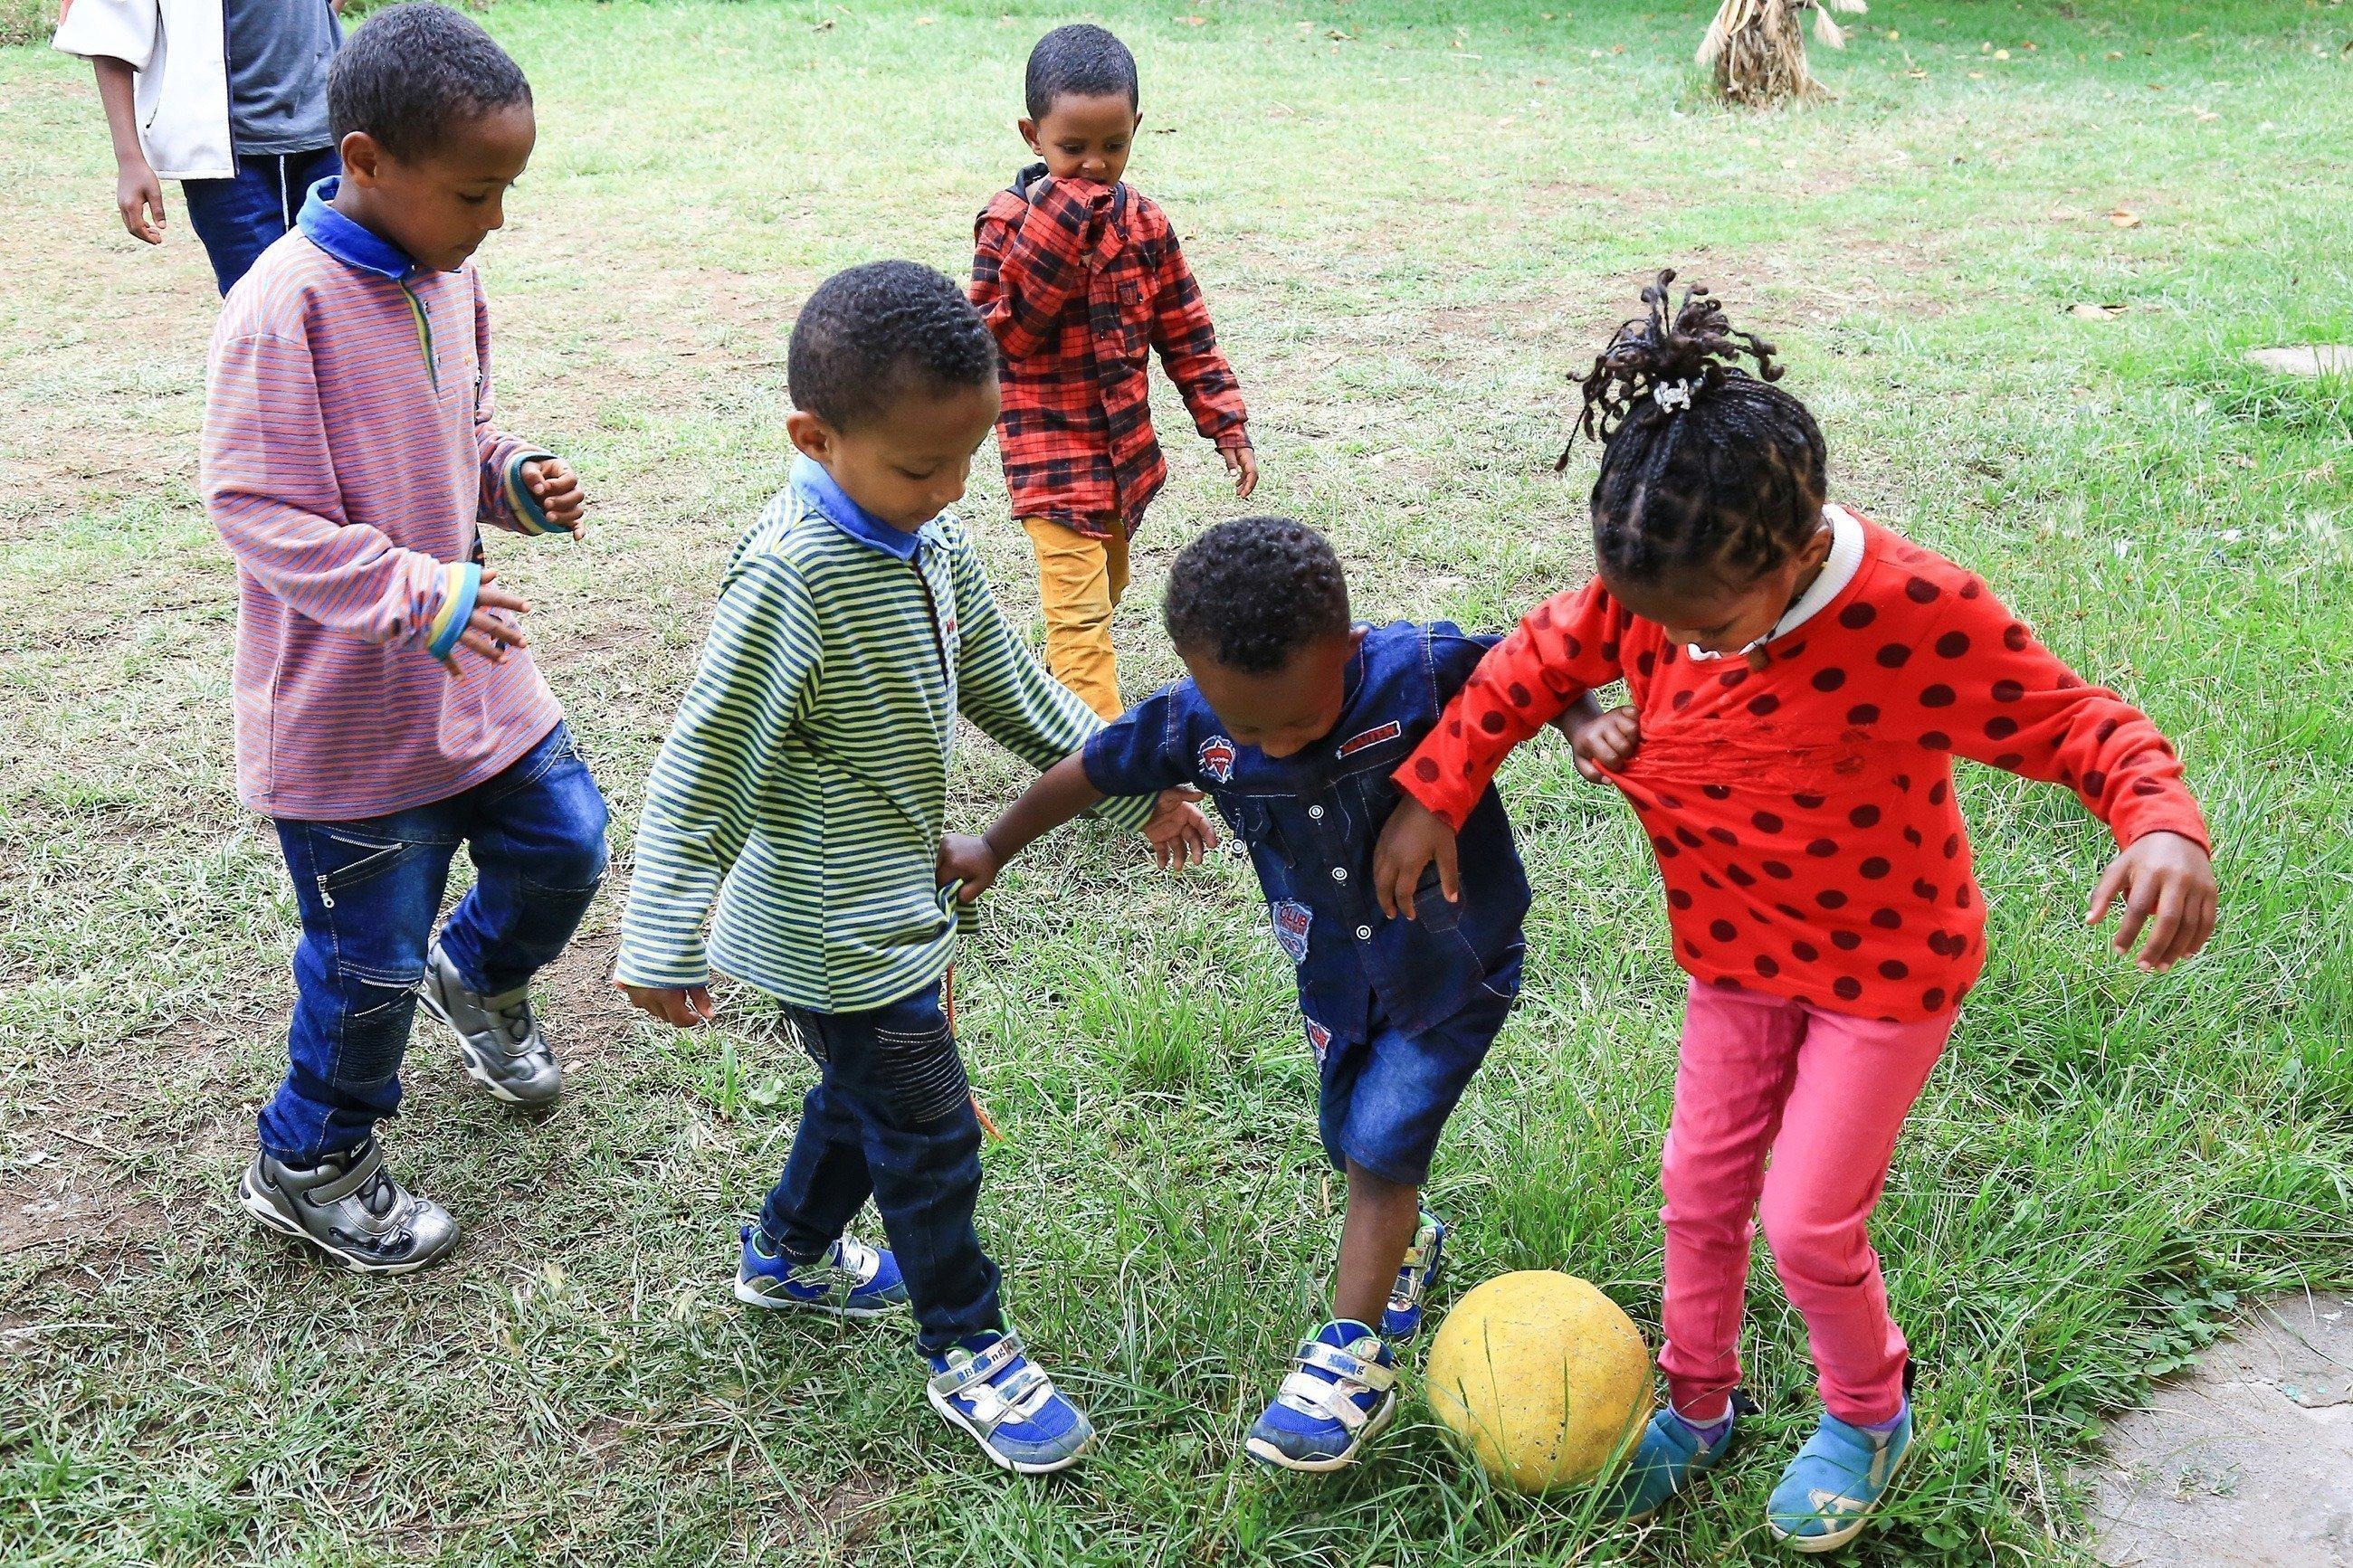 Bambini africani giocano a calcio.